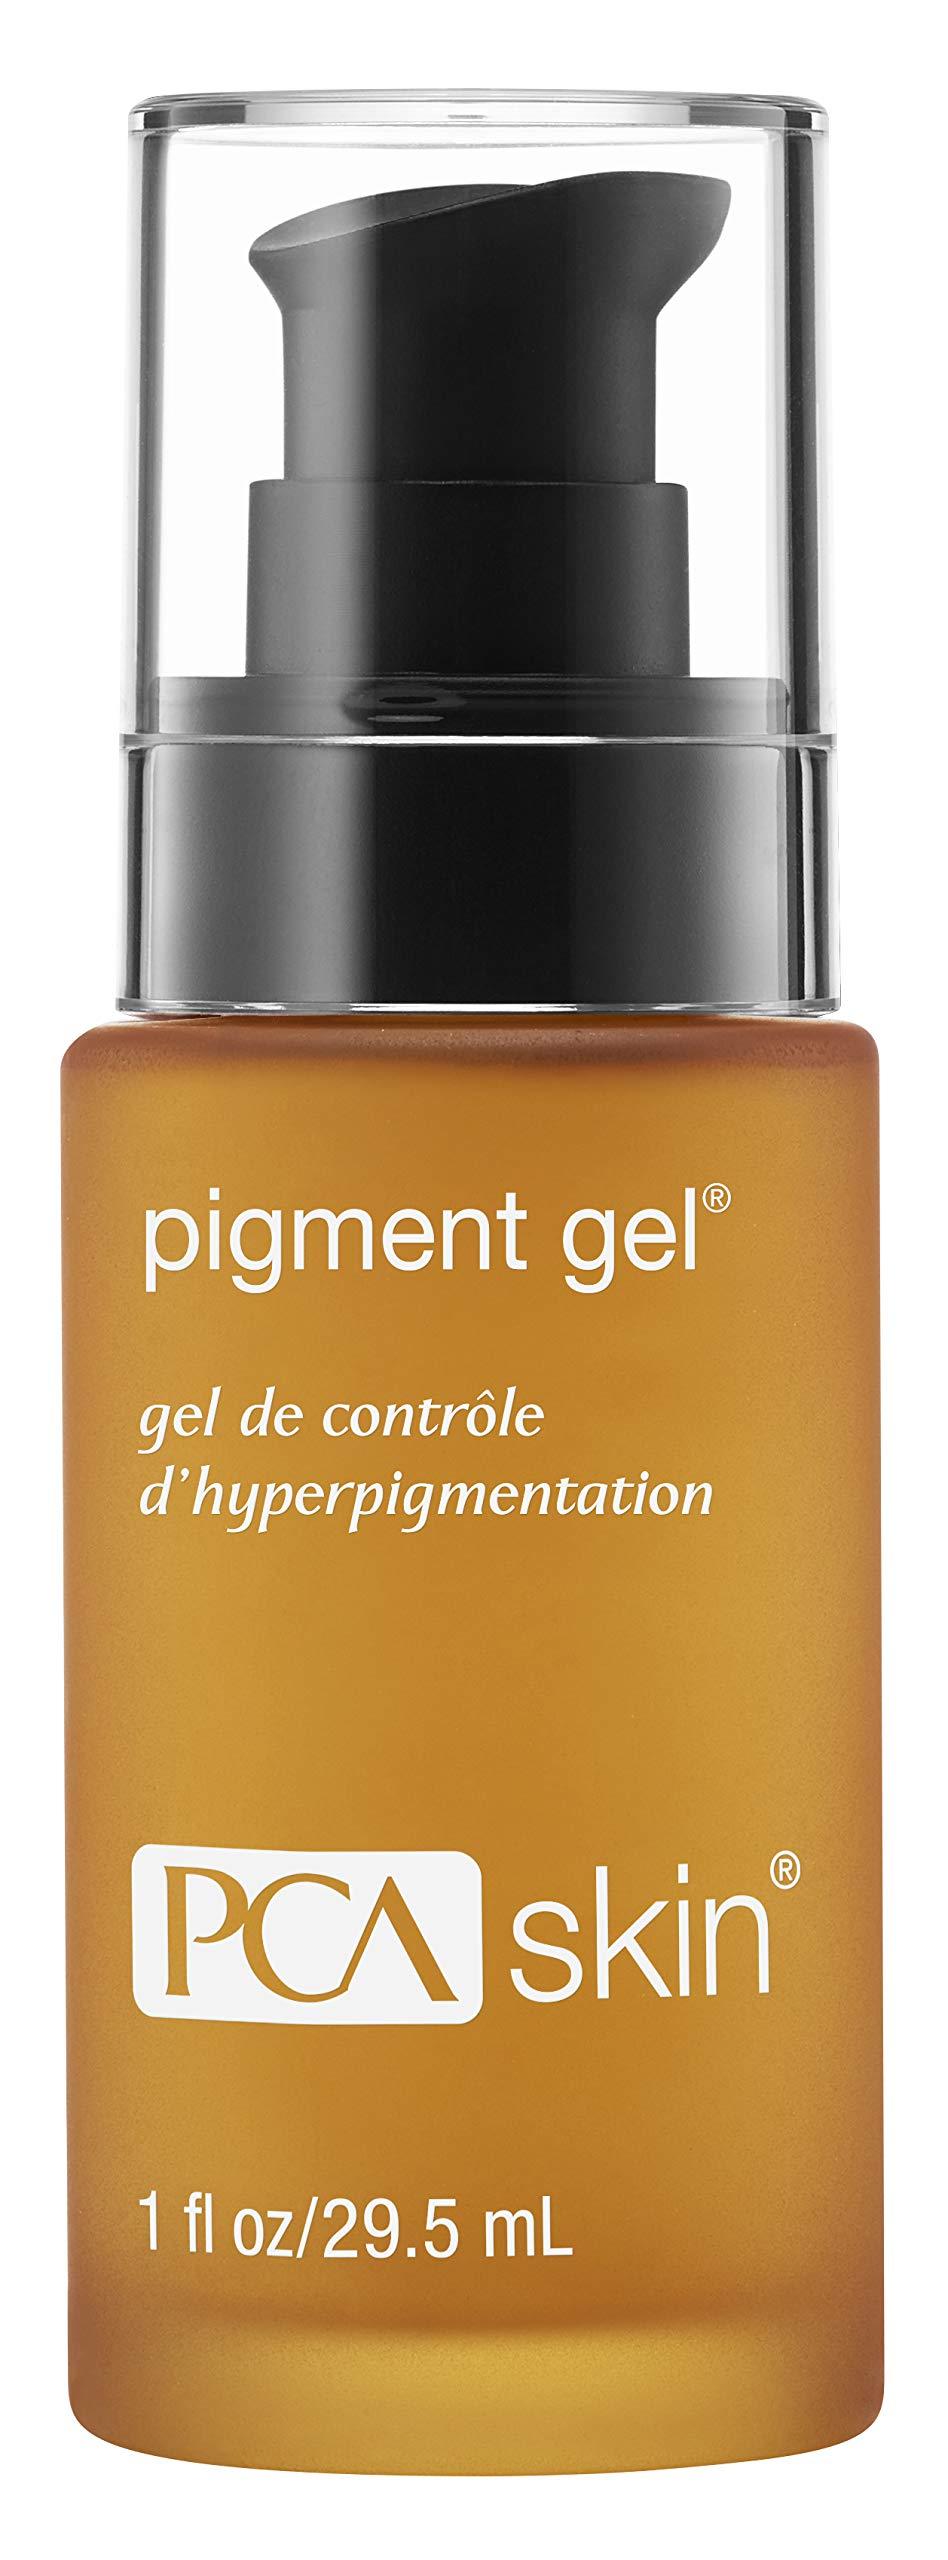 PCA SKIN Pigment Gel, Discoloration Spot Treatment Serum, 1 fluid ounce by PCA SKIN